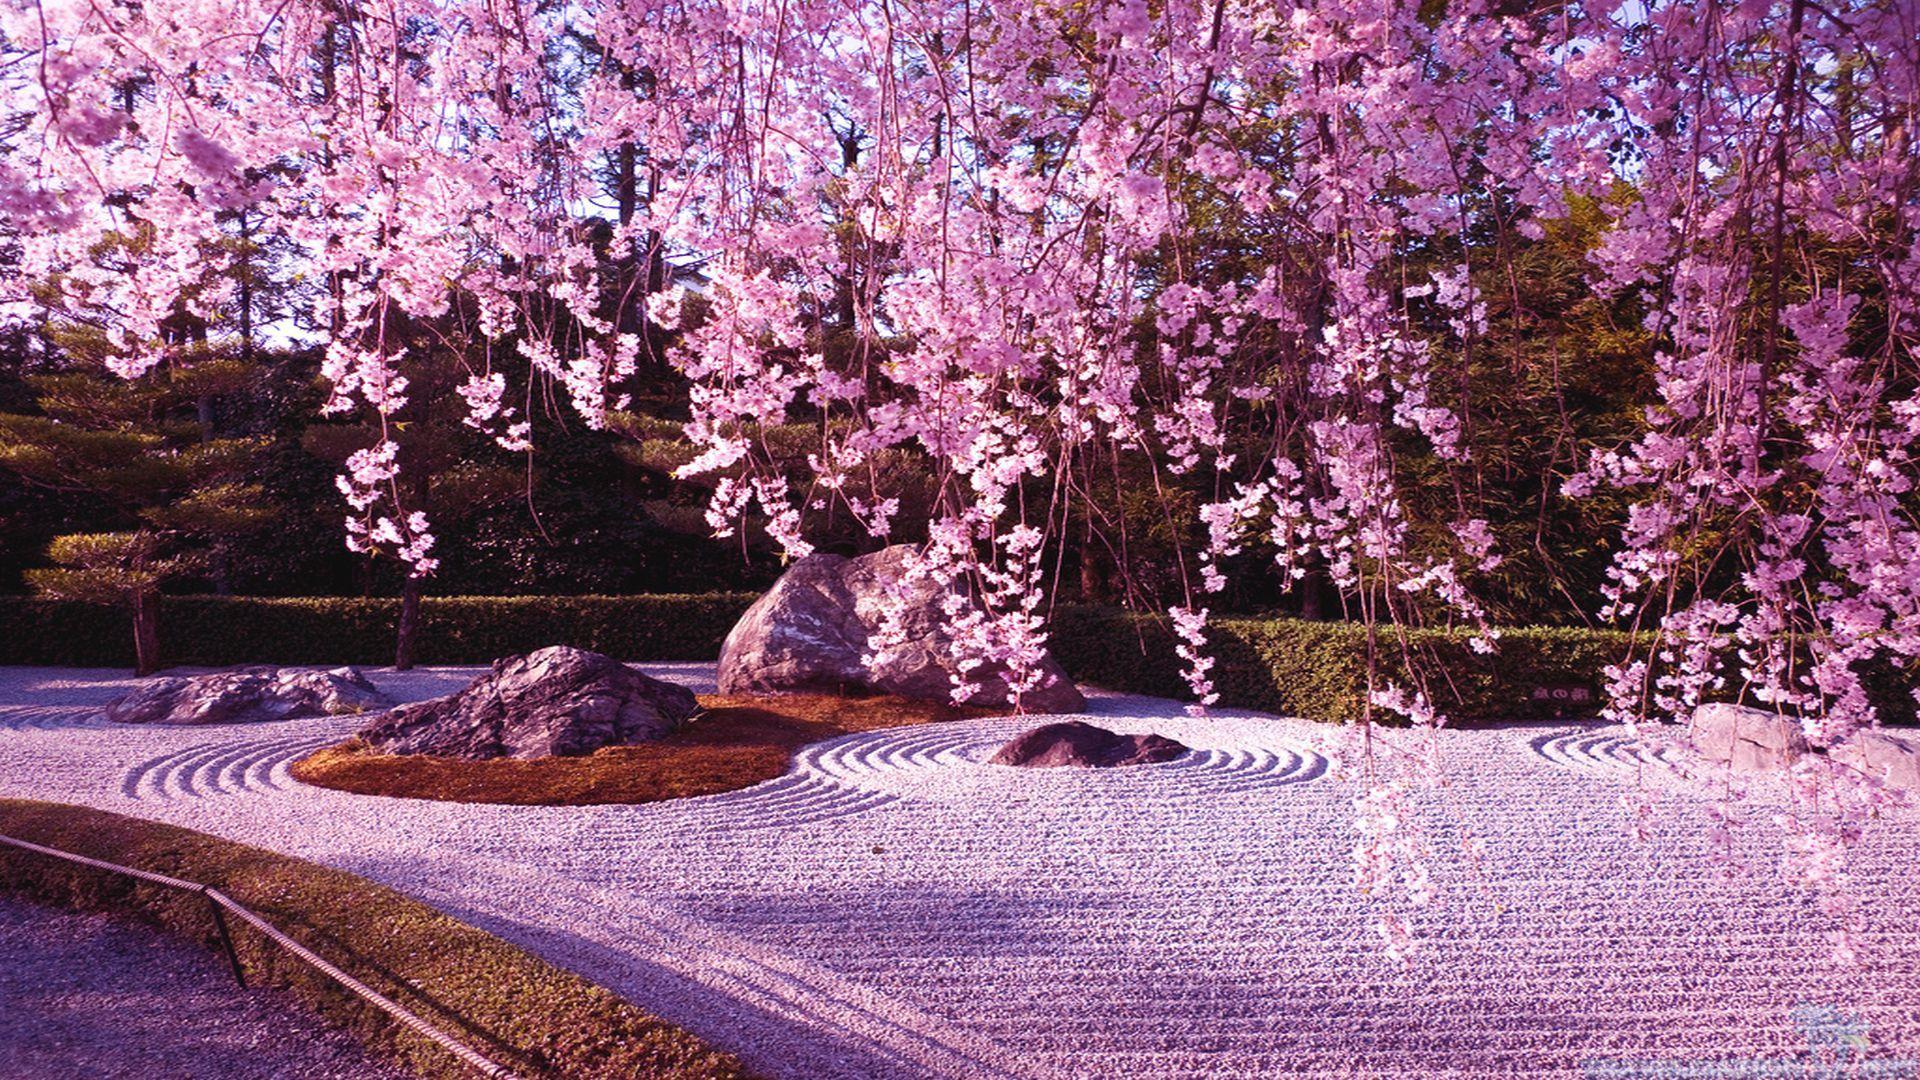 Purple Cherry Blossom Flower Cherry Blossom Wallpaper Blossom Garden Cherry Blossom Background Anime japanese cherry blossom wallpaper